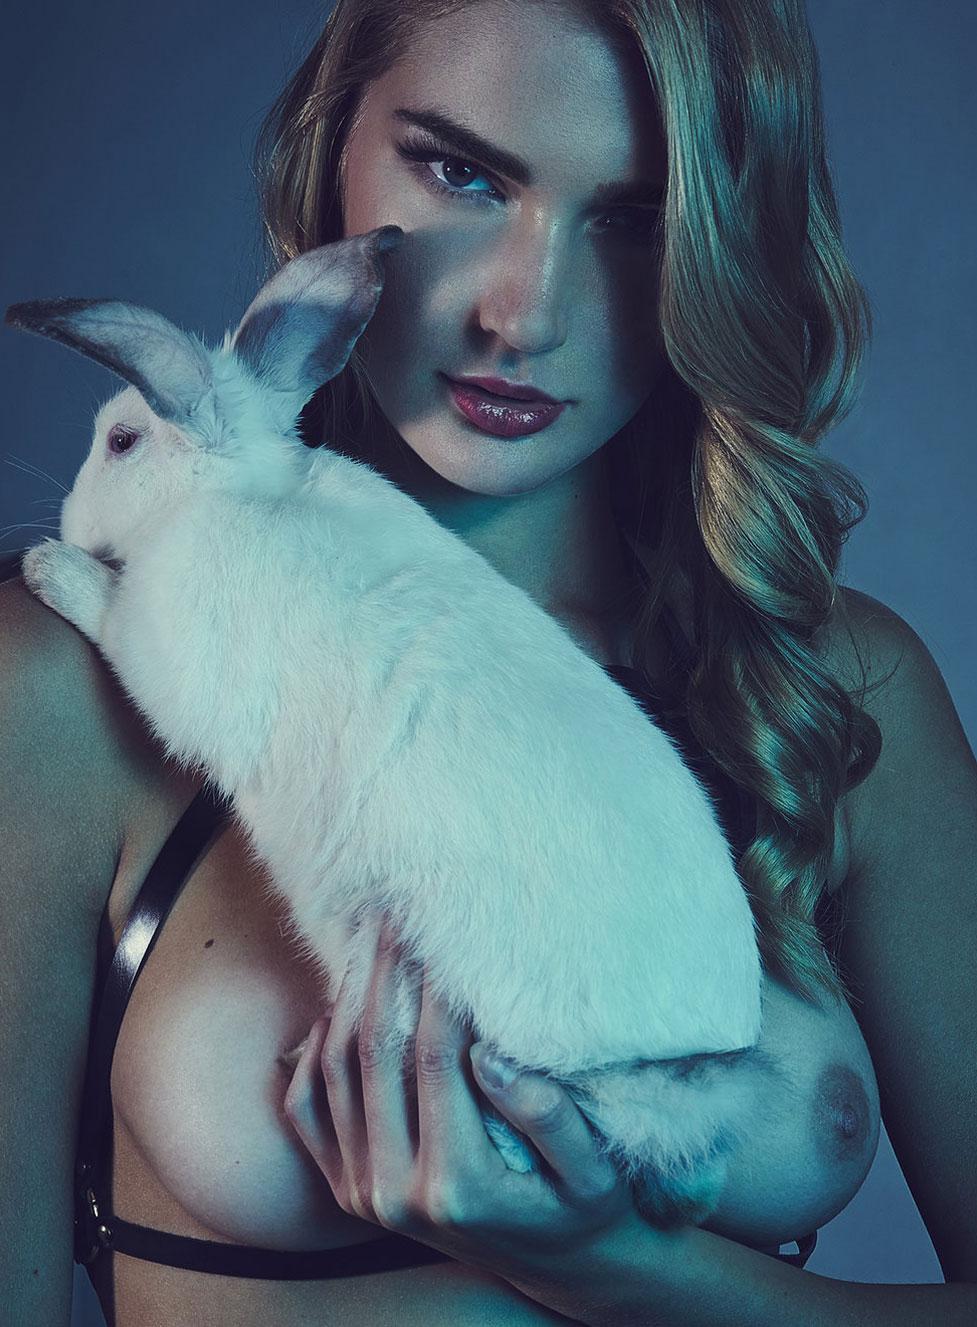 Дарья, Модеста и кролики / фото 11